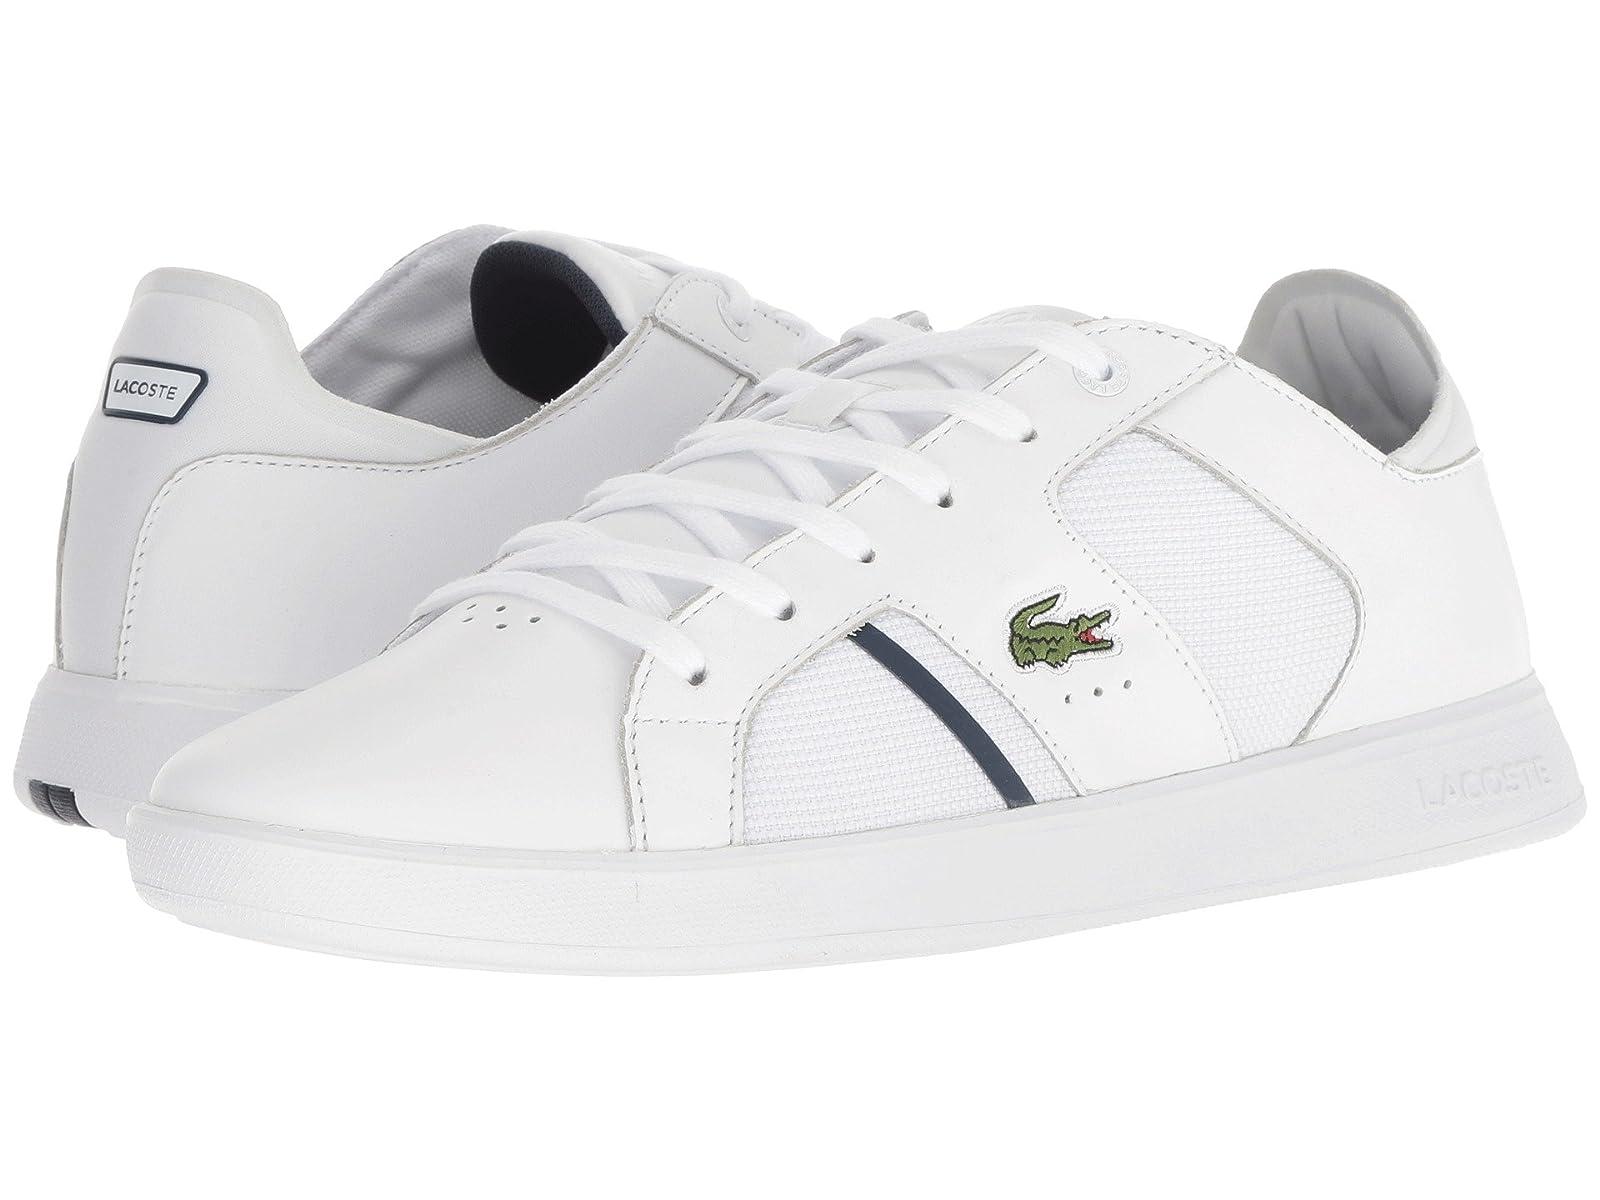 Lacoste Novas 318 2Atmospheric grades have affordable shoes